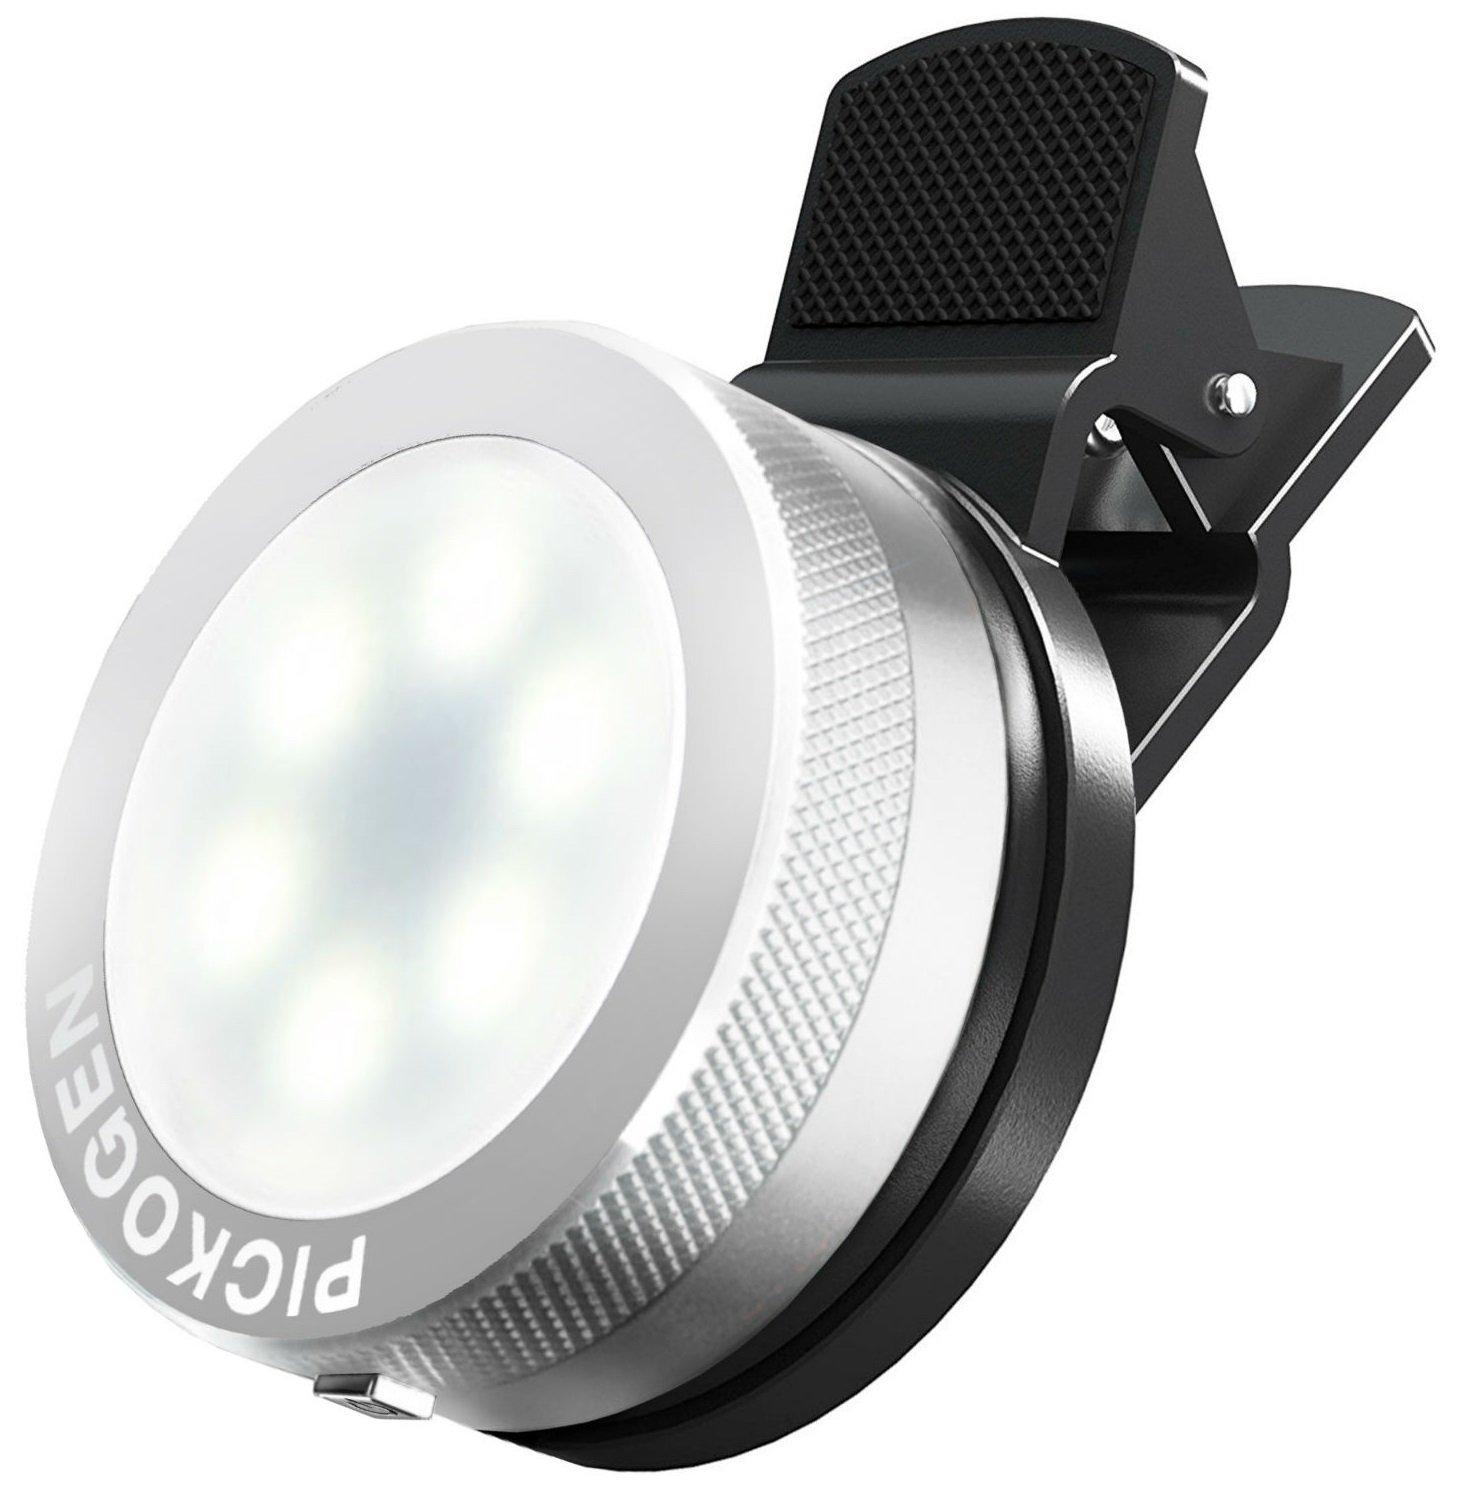 Universal Clip-On Mini LED Light Portable Pocket Spotlight for iPhone, iPad, iPod, Samsung, LG, Motorola, HTC, Nokia, Cell Phones and Tablets Camera Video Light (Gold)